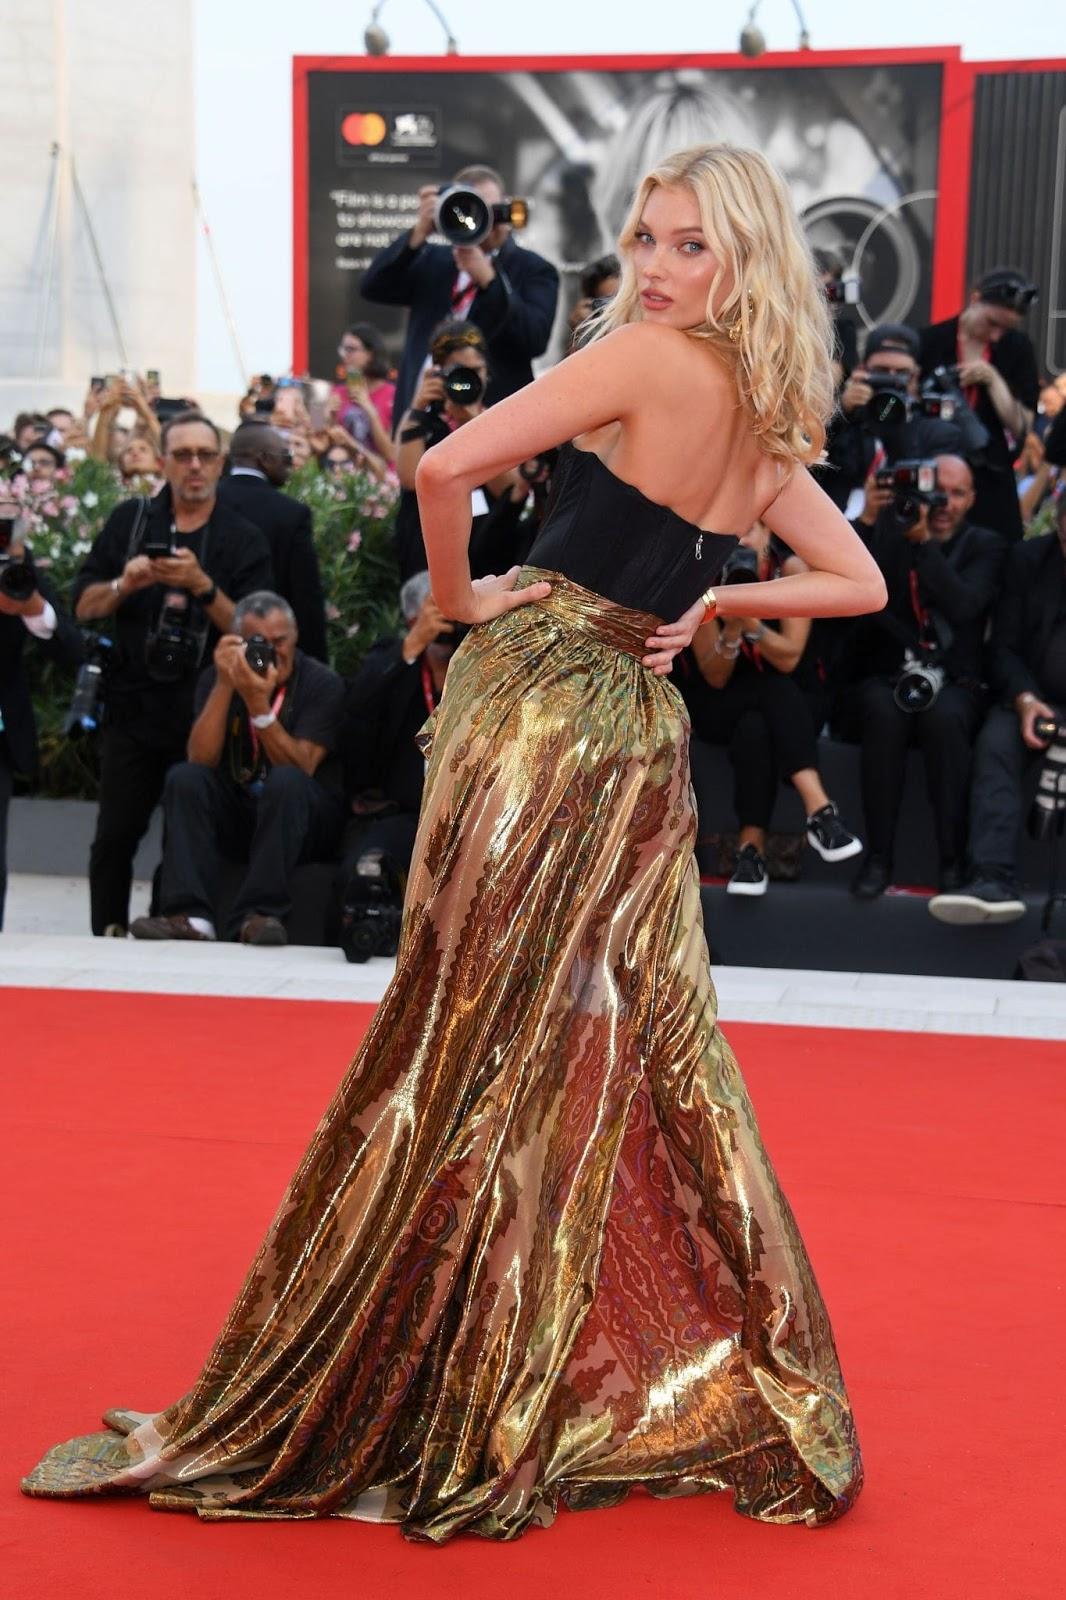 Elsa Hosk – 'Marriage Story' Premiere at the 2019 Venice Film Festival red carpet